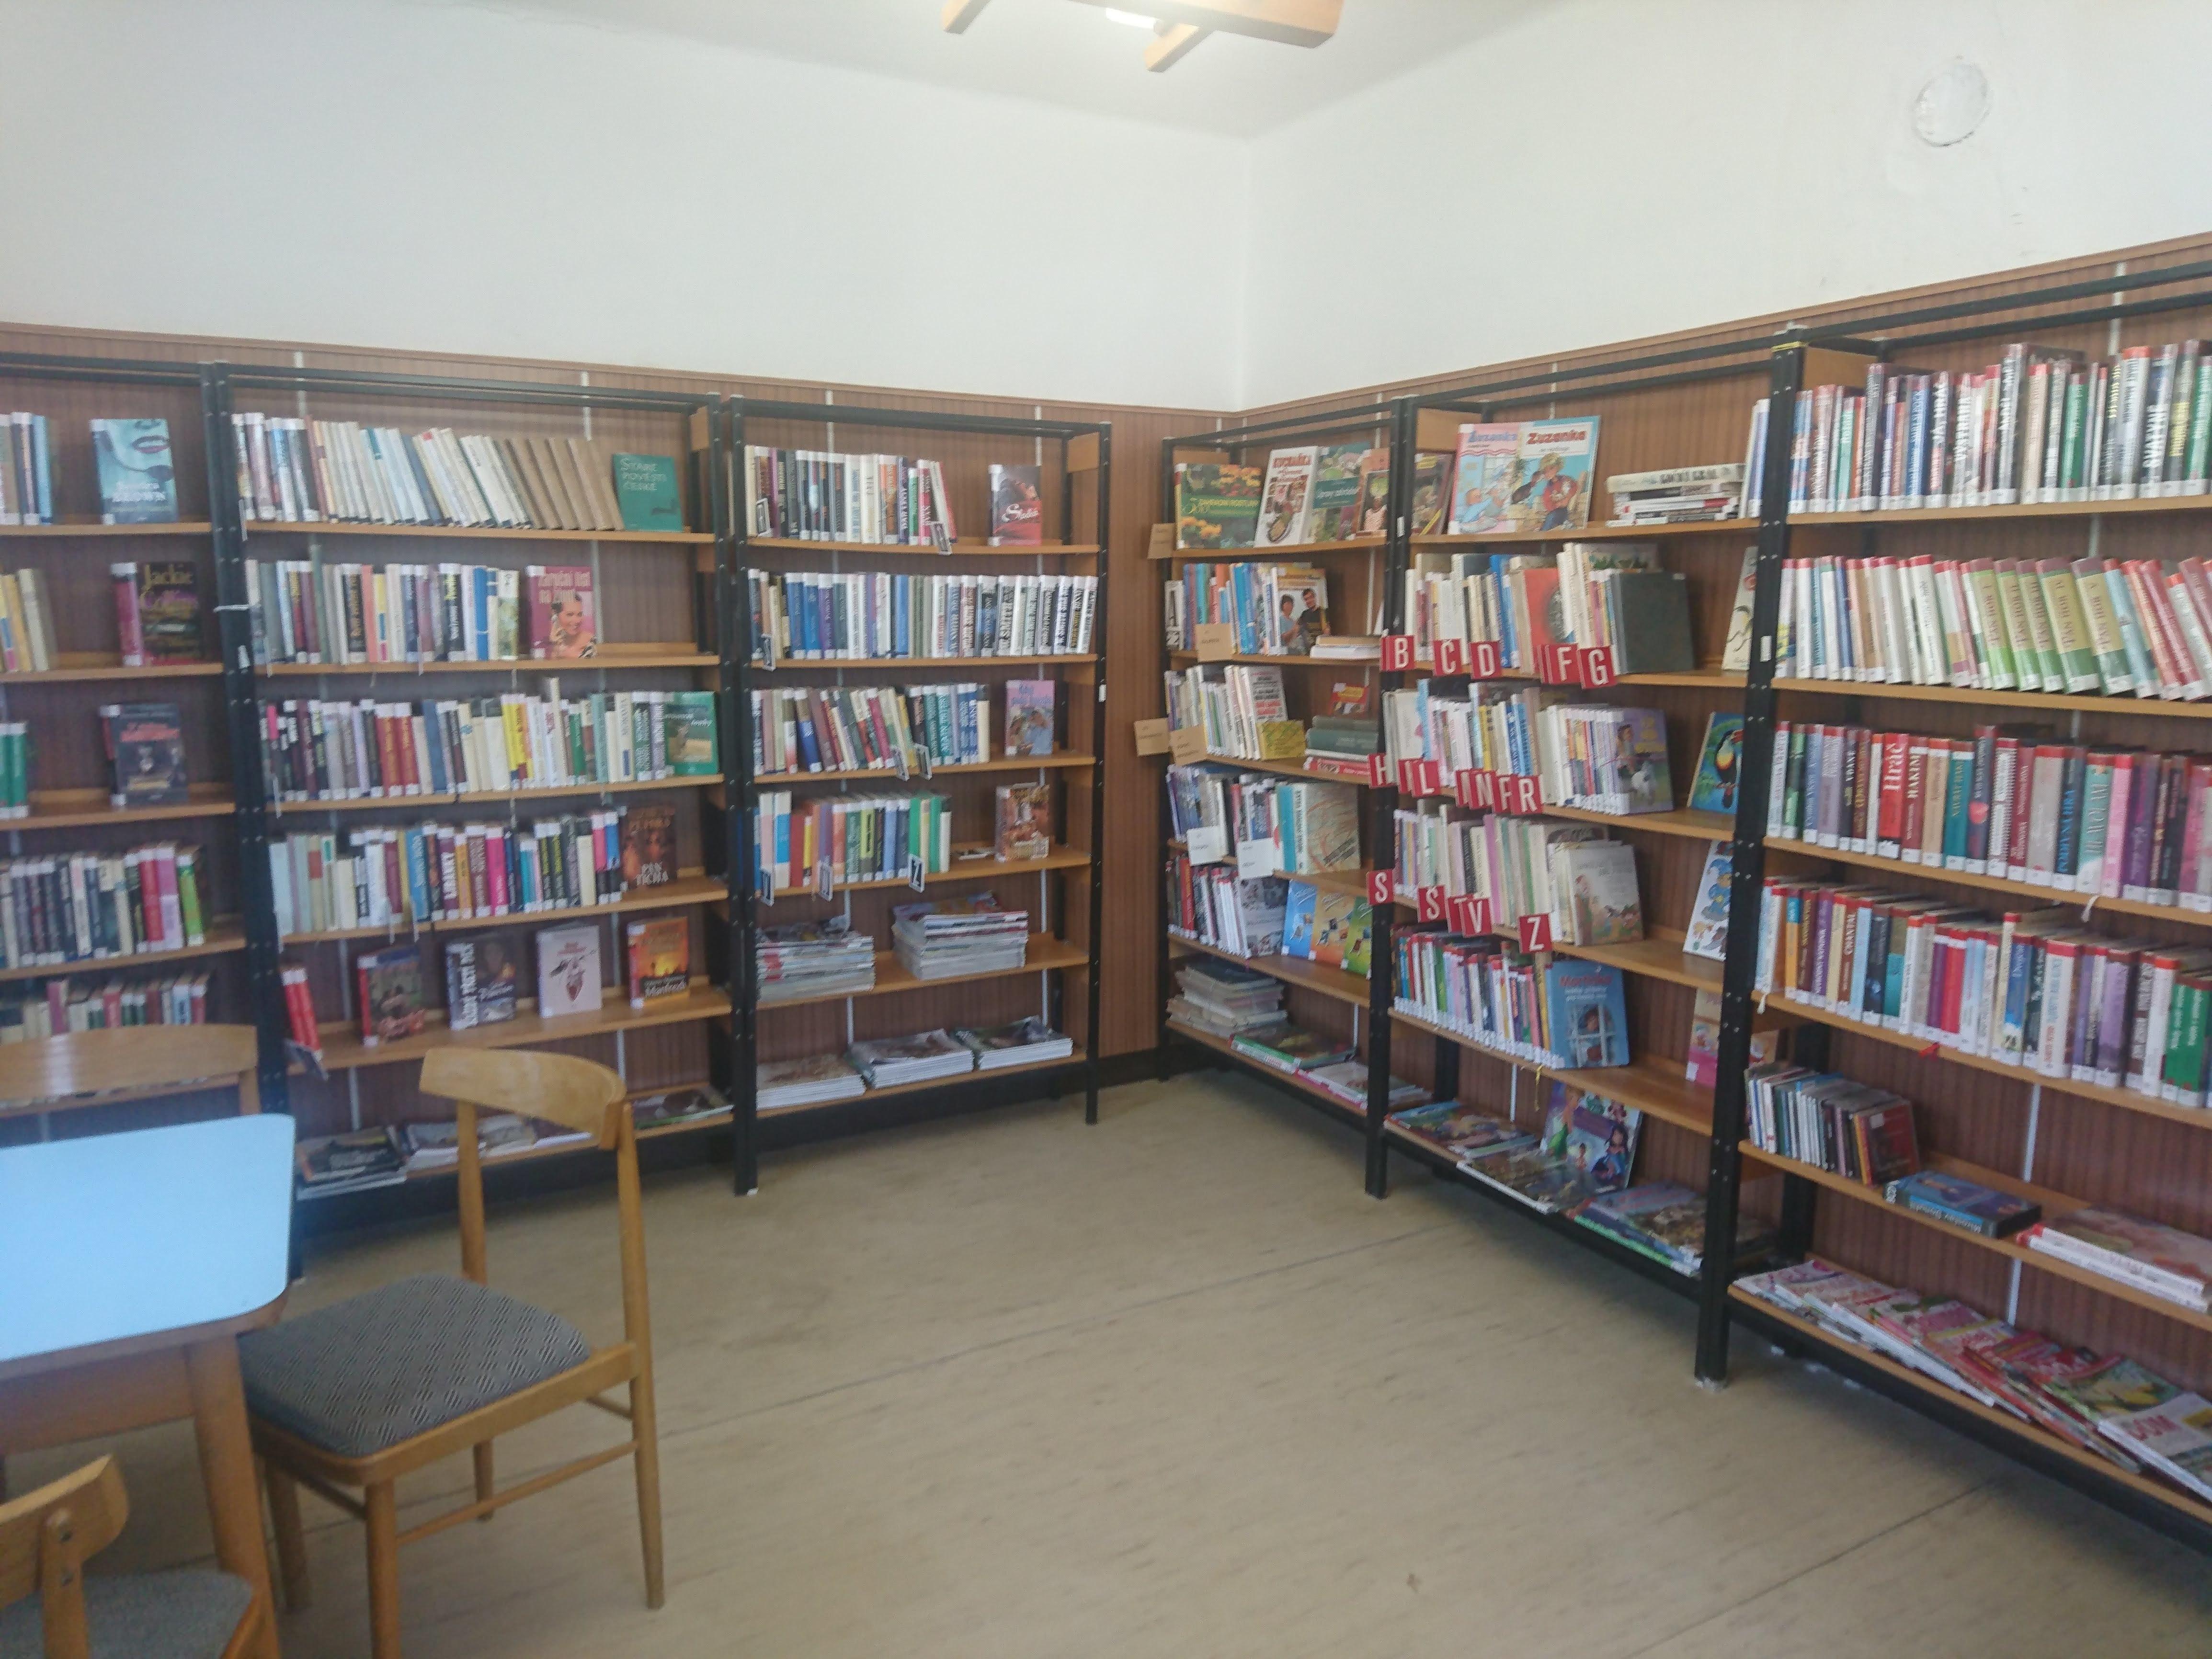 Fofografie knihovny